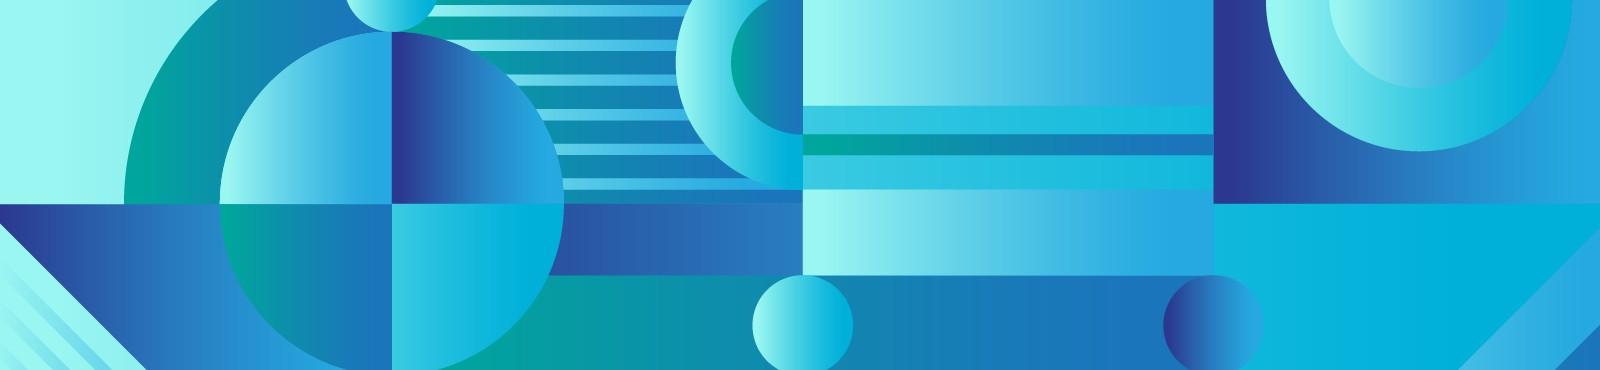 Jumbotron header image